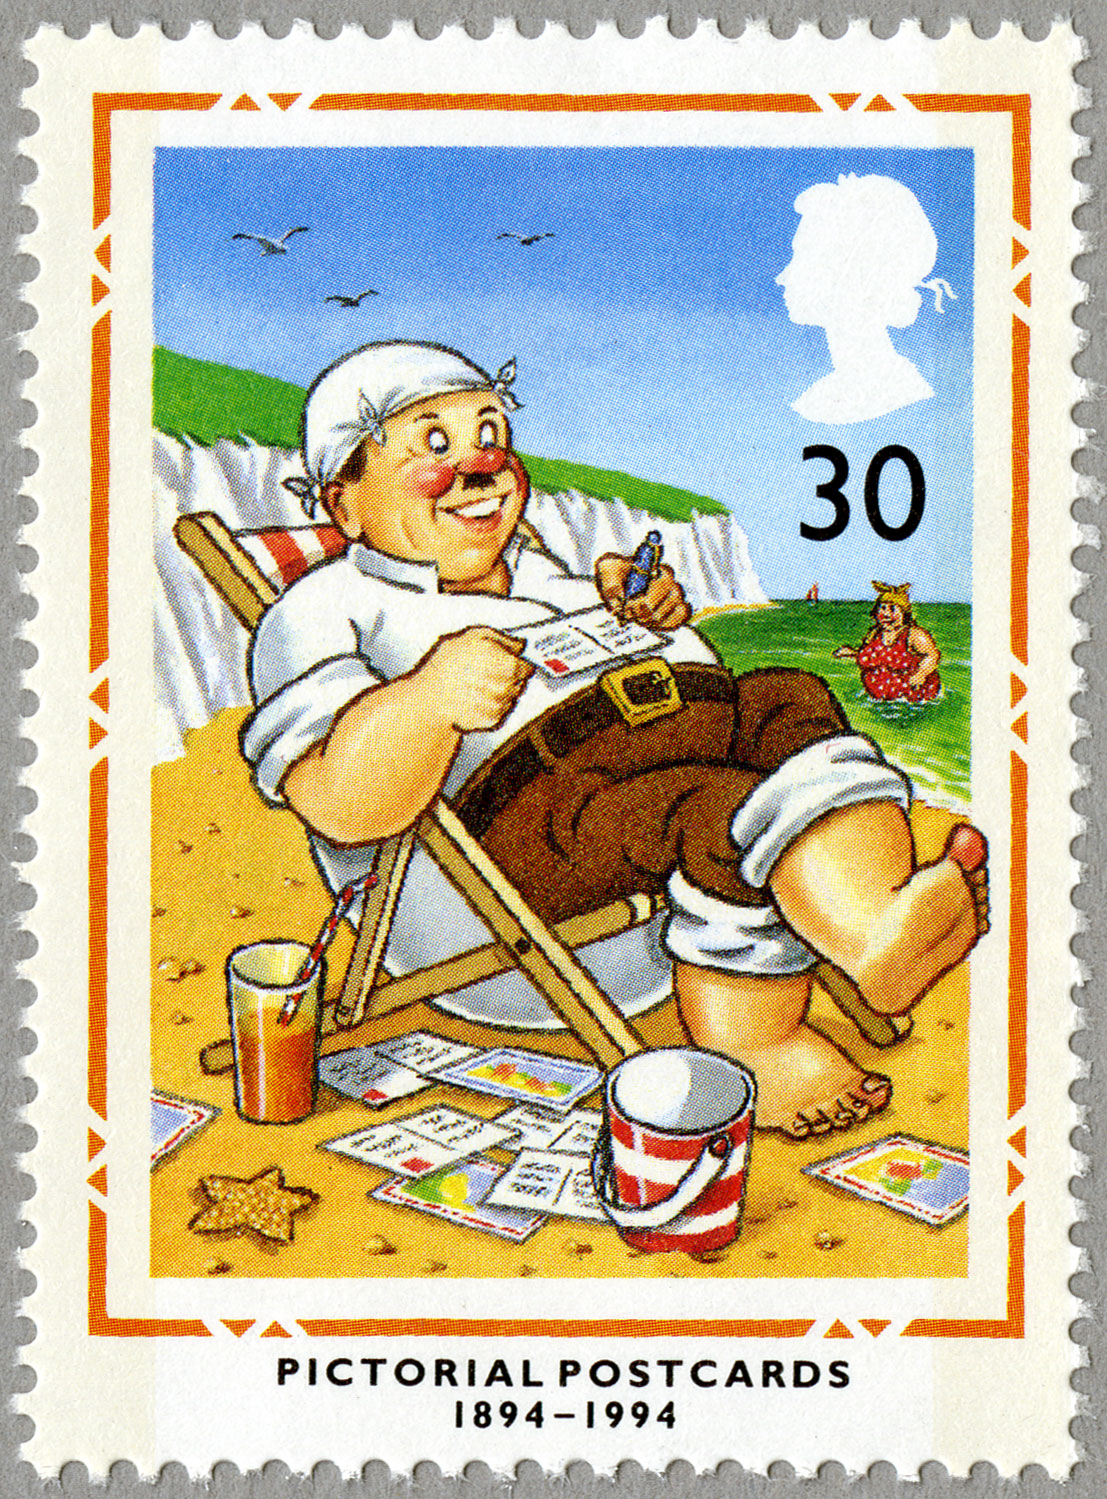 30p, Pictorial Postcards, 1994